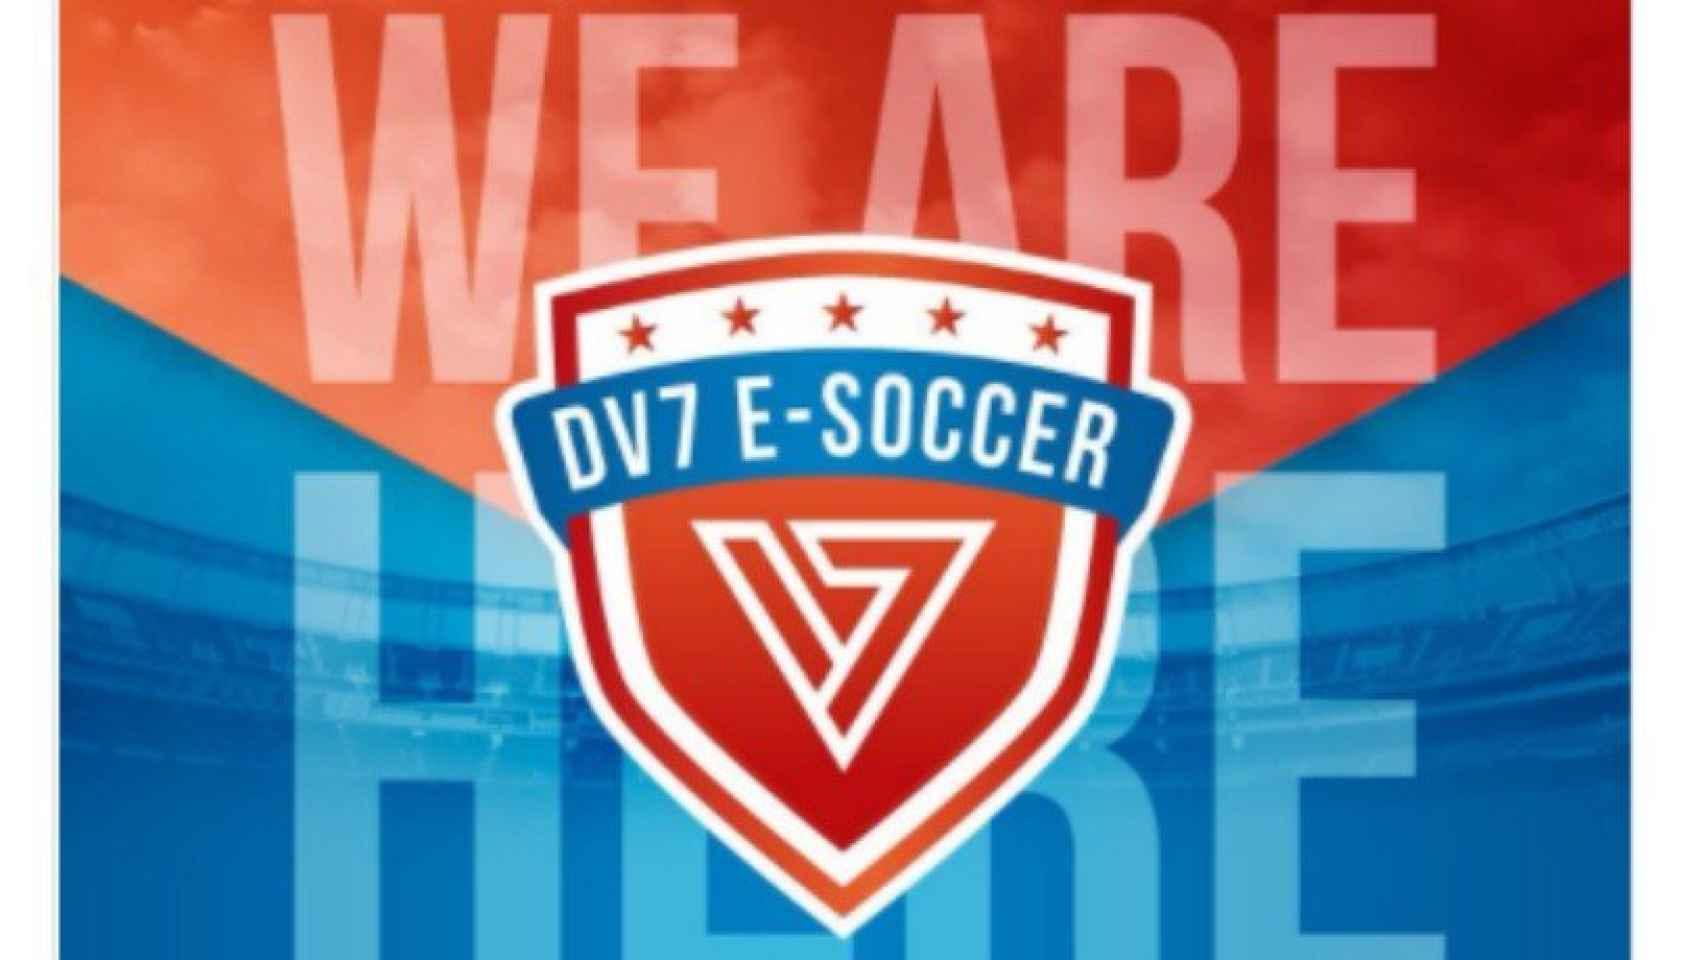 Villa se une a Esports. Foto. Twitter (@dv7esoccer)